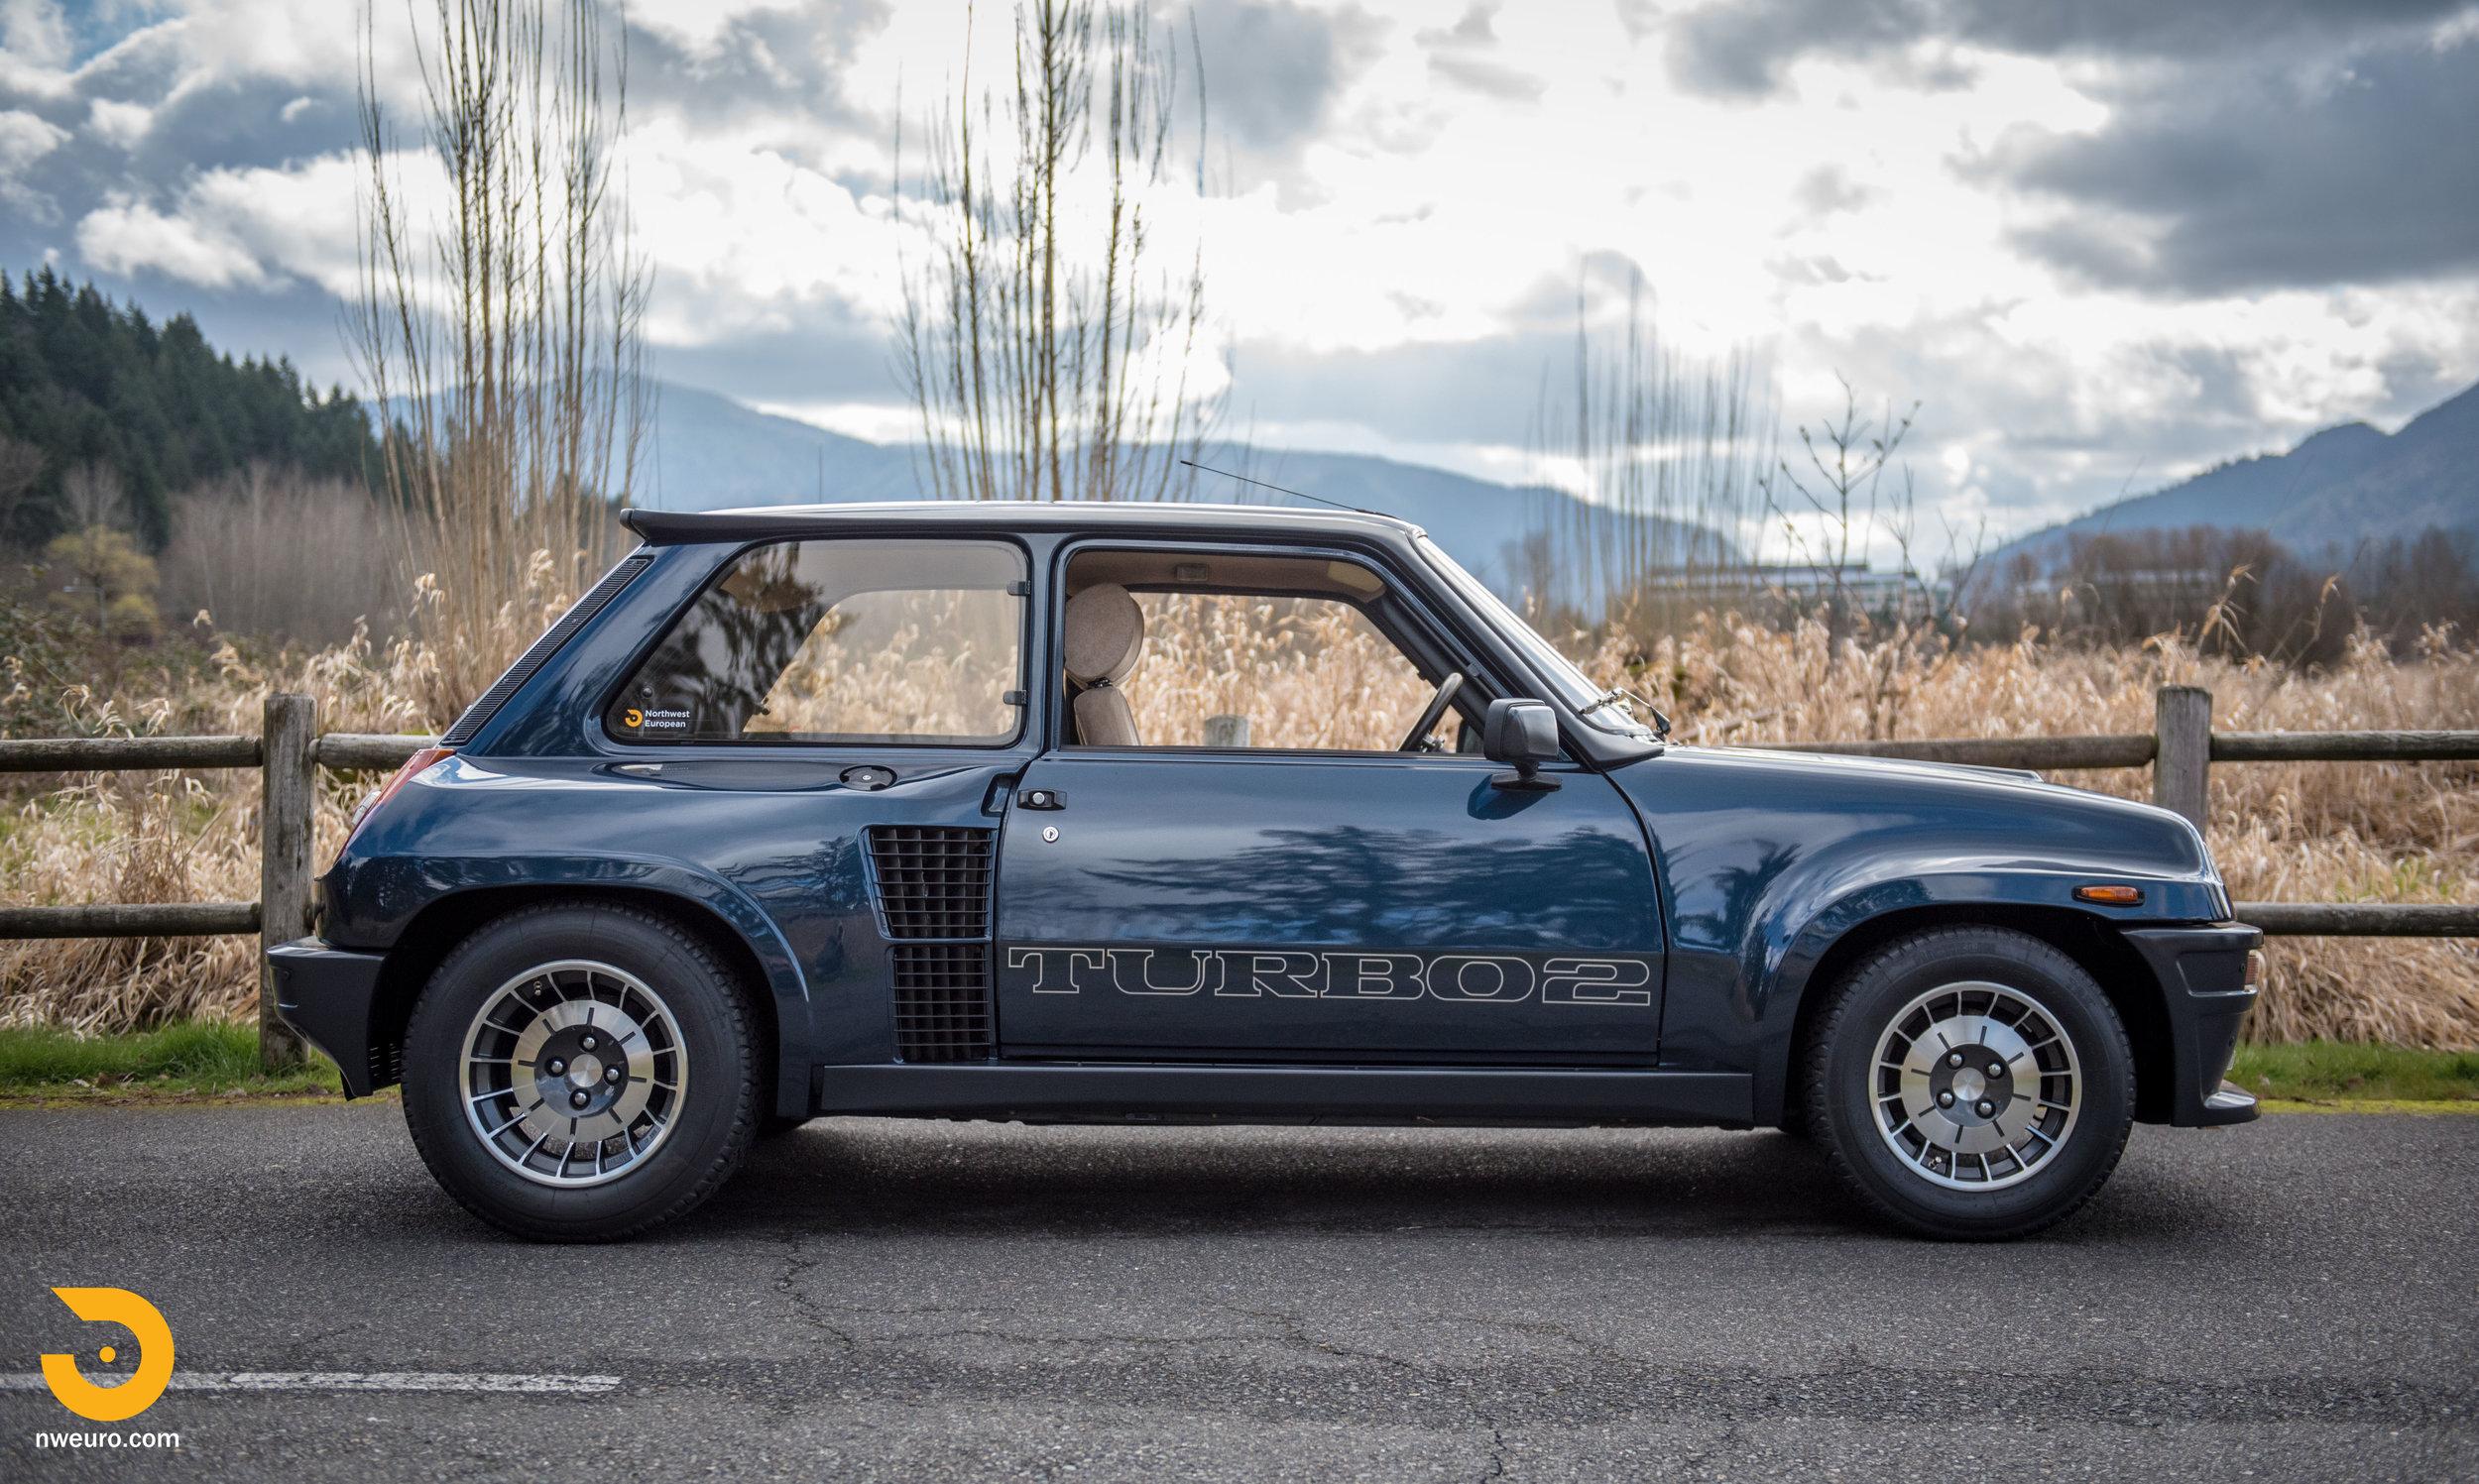 1983 Renault R5 Turbo 2-4.jpg